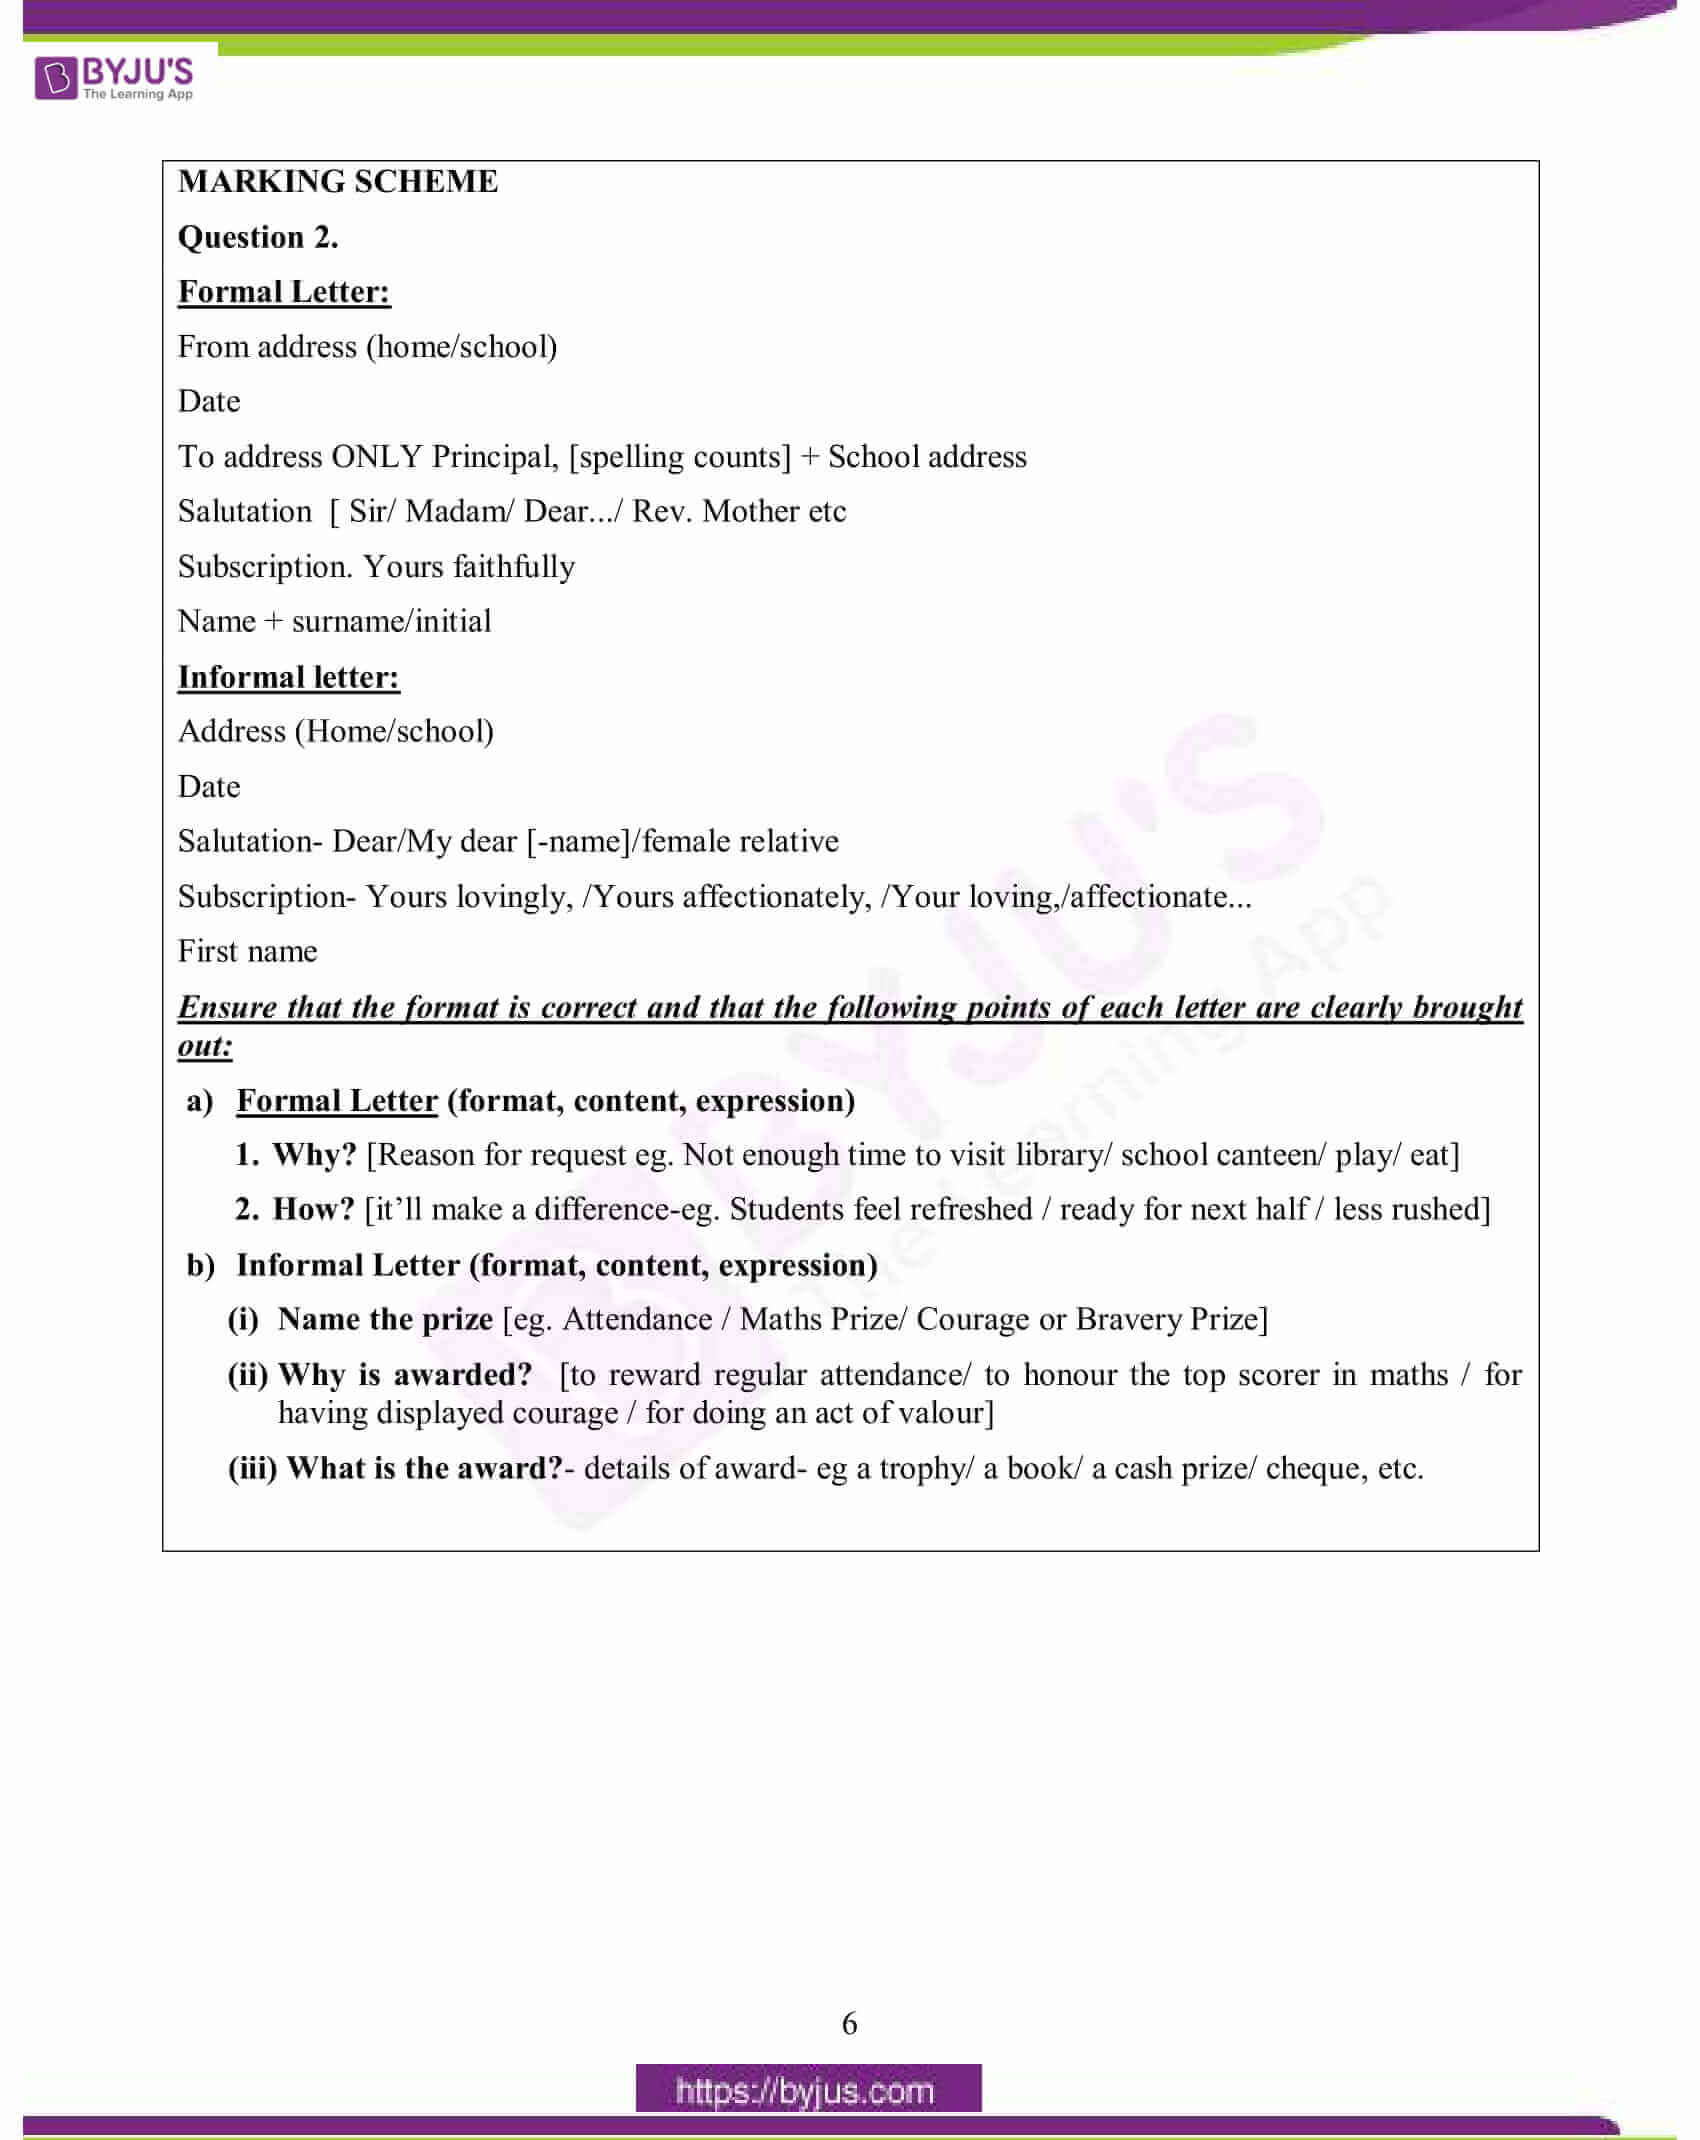 icse class 10 eng lan question paper solution 2015 05